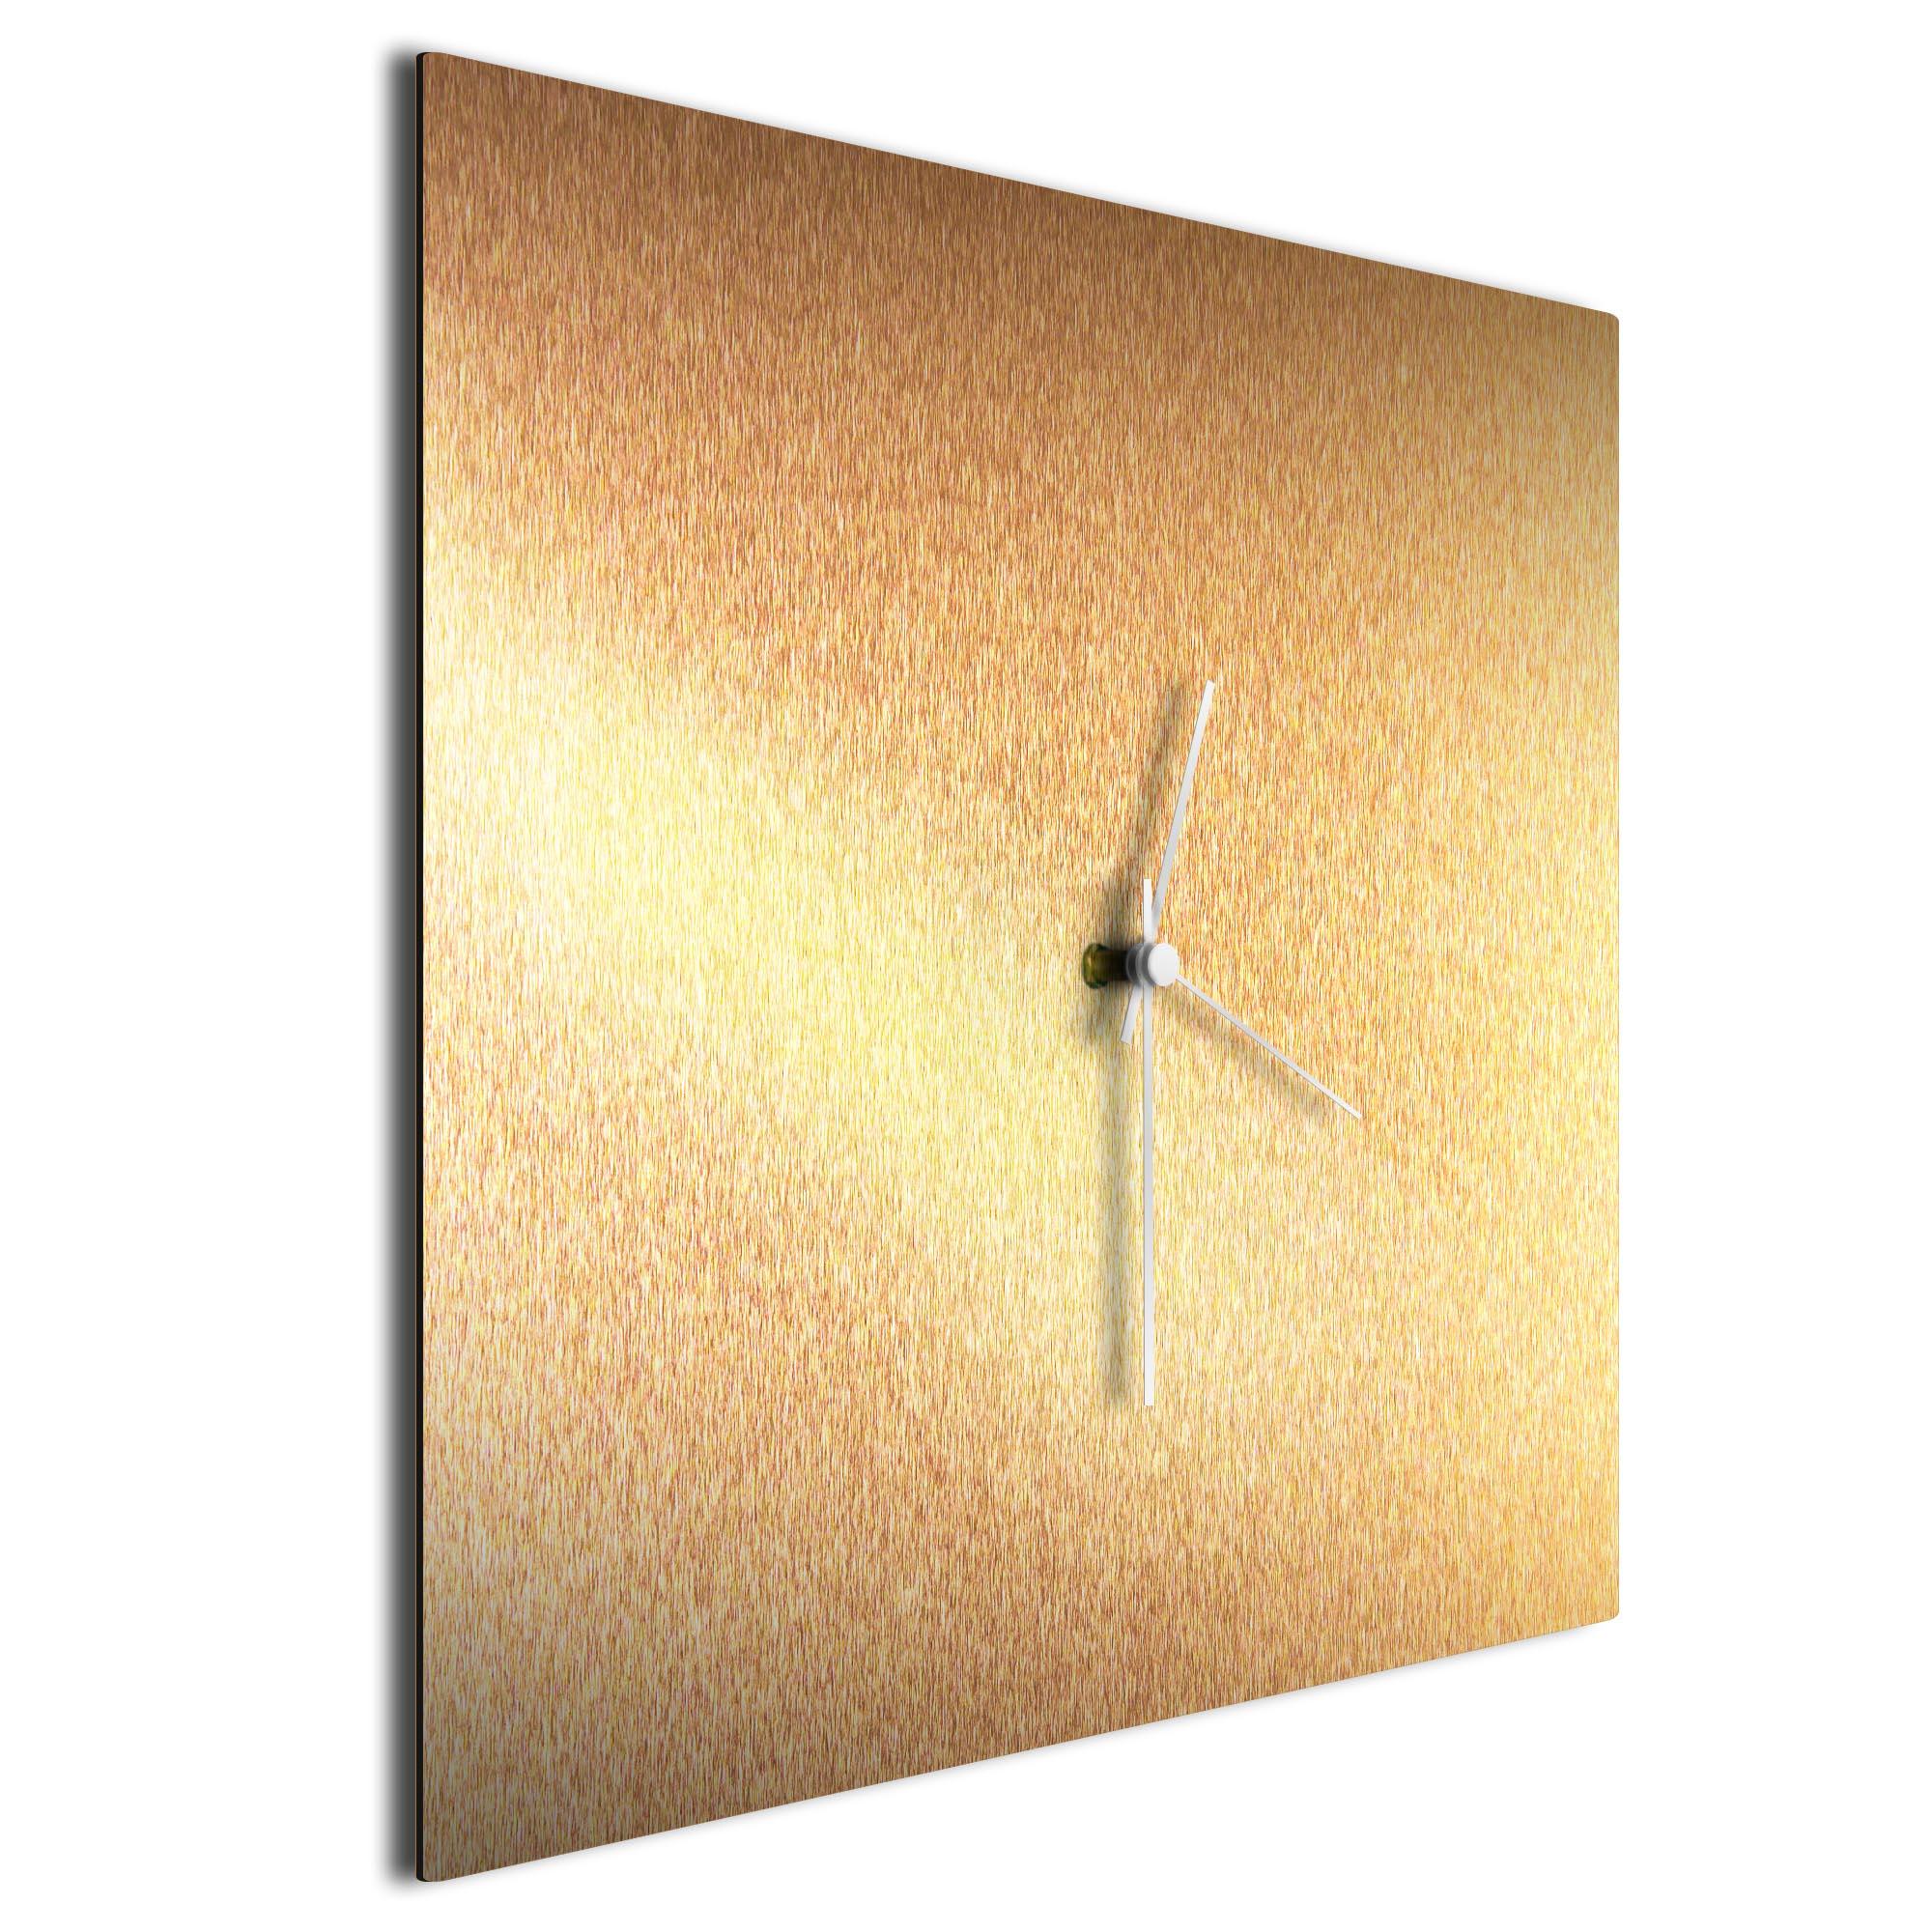 Bronzesmith Square Clock Large White - Image 2